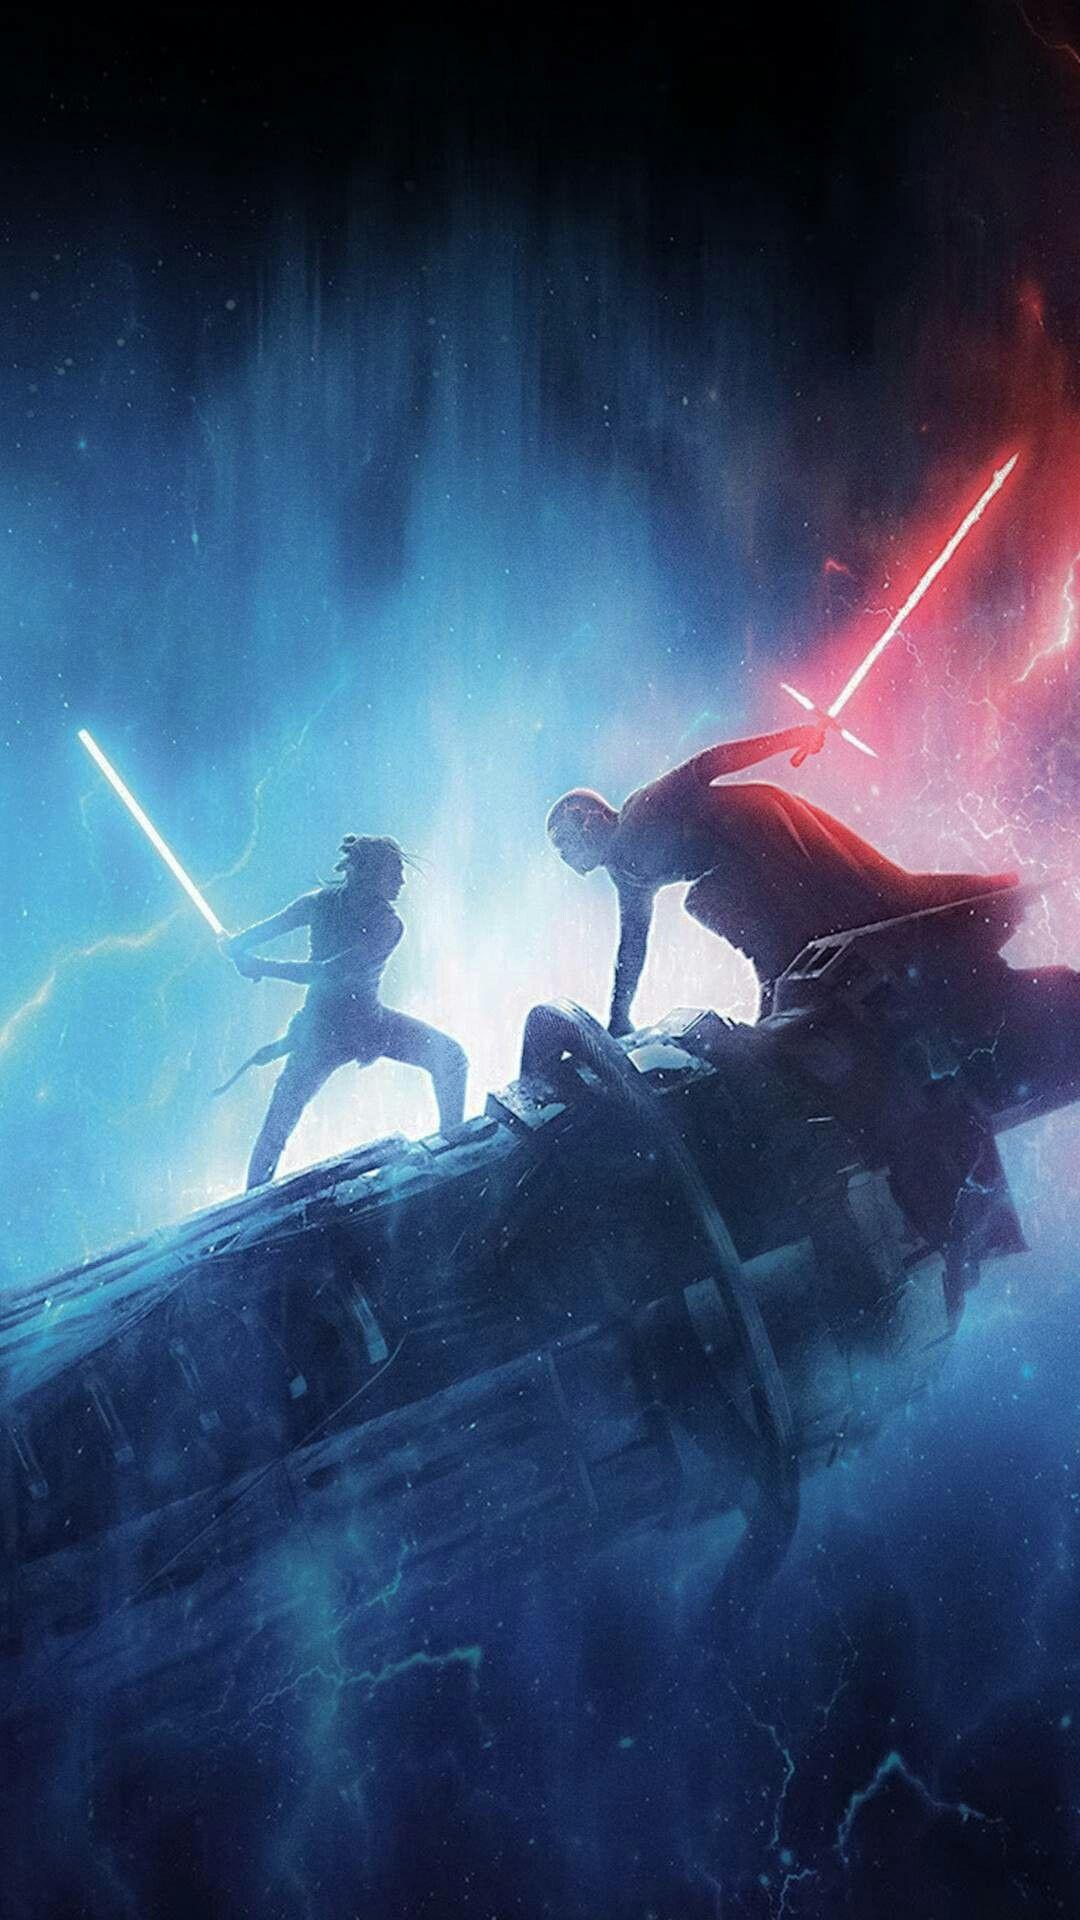 Star Wars The Rise Of Skywalker Can J J Abrams Stick The Landing Star Wars Background Star Wars Wallpaper Iphone Star Wars Poster